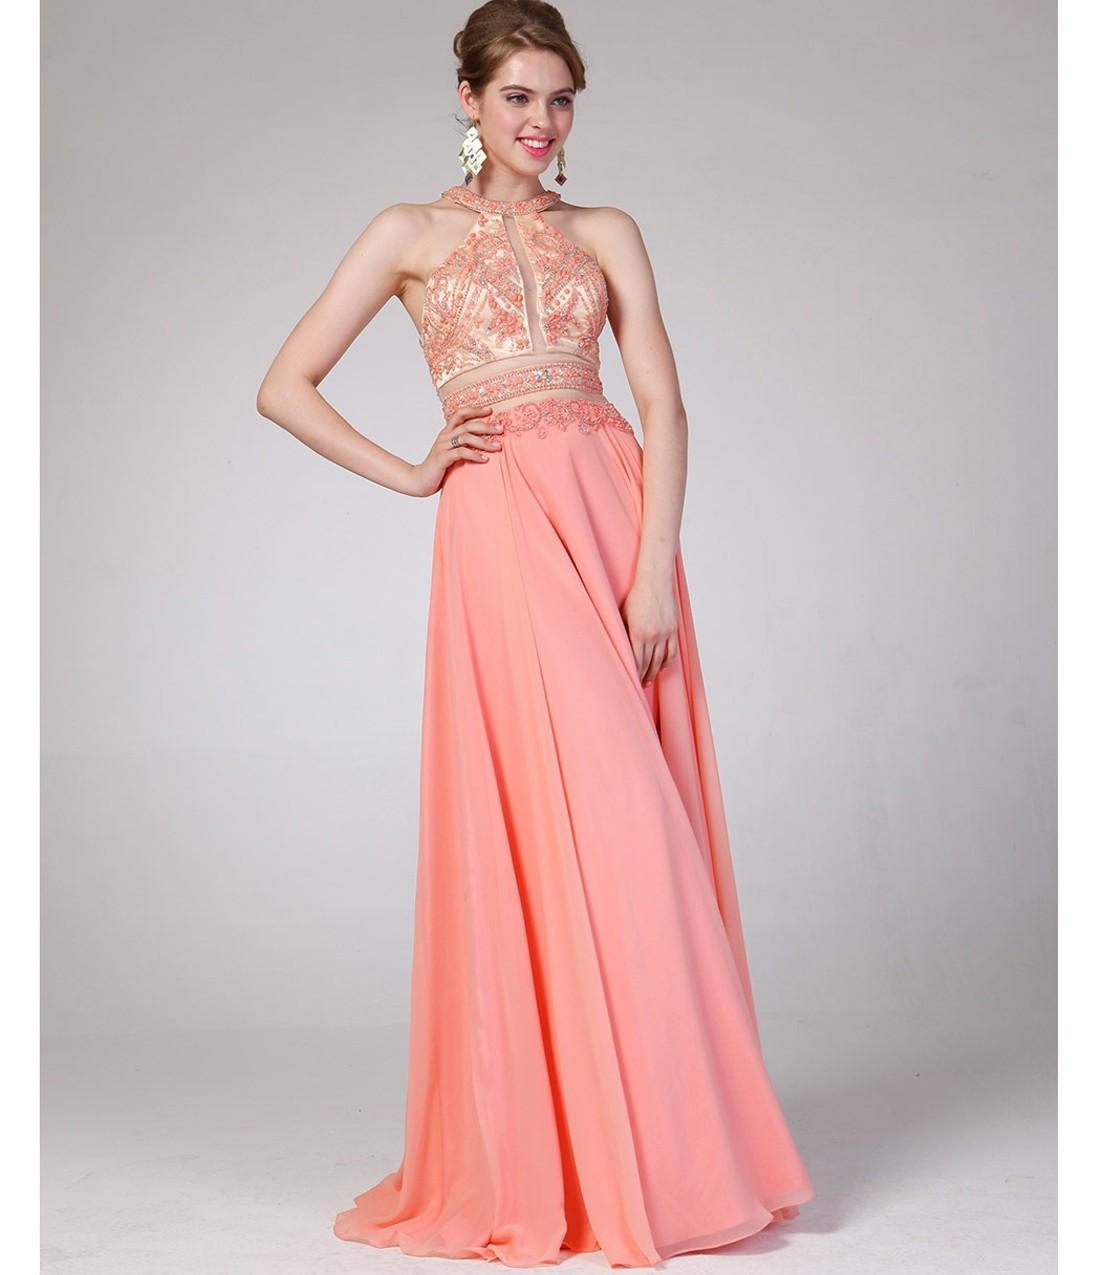 Peach Long Chiffon Prom Dresses A Line Halter Beaded Party Dress ...